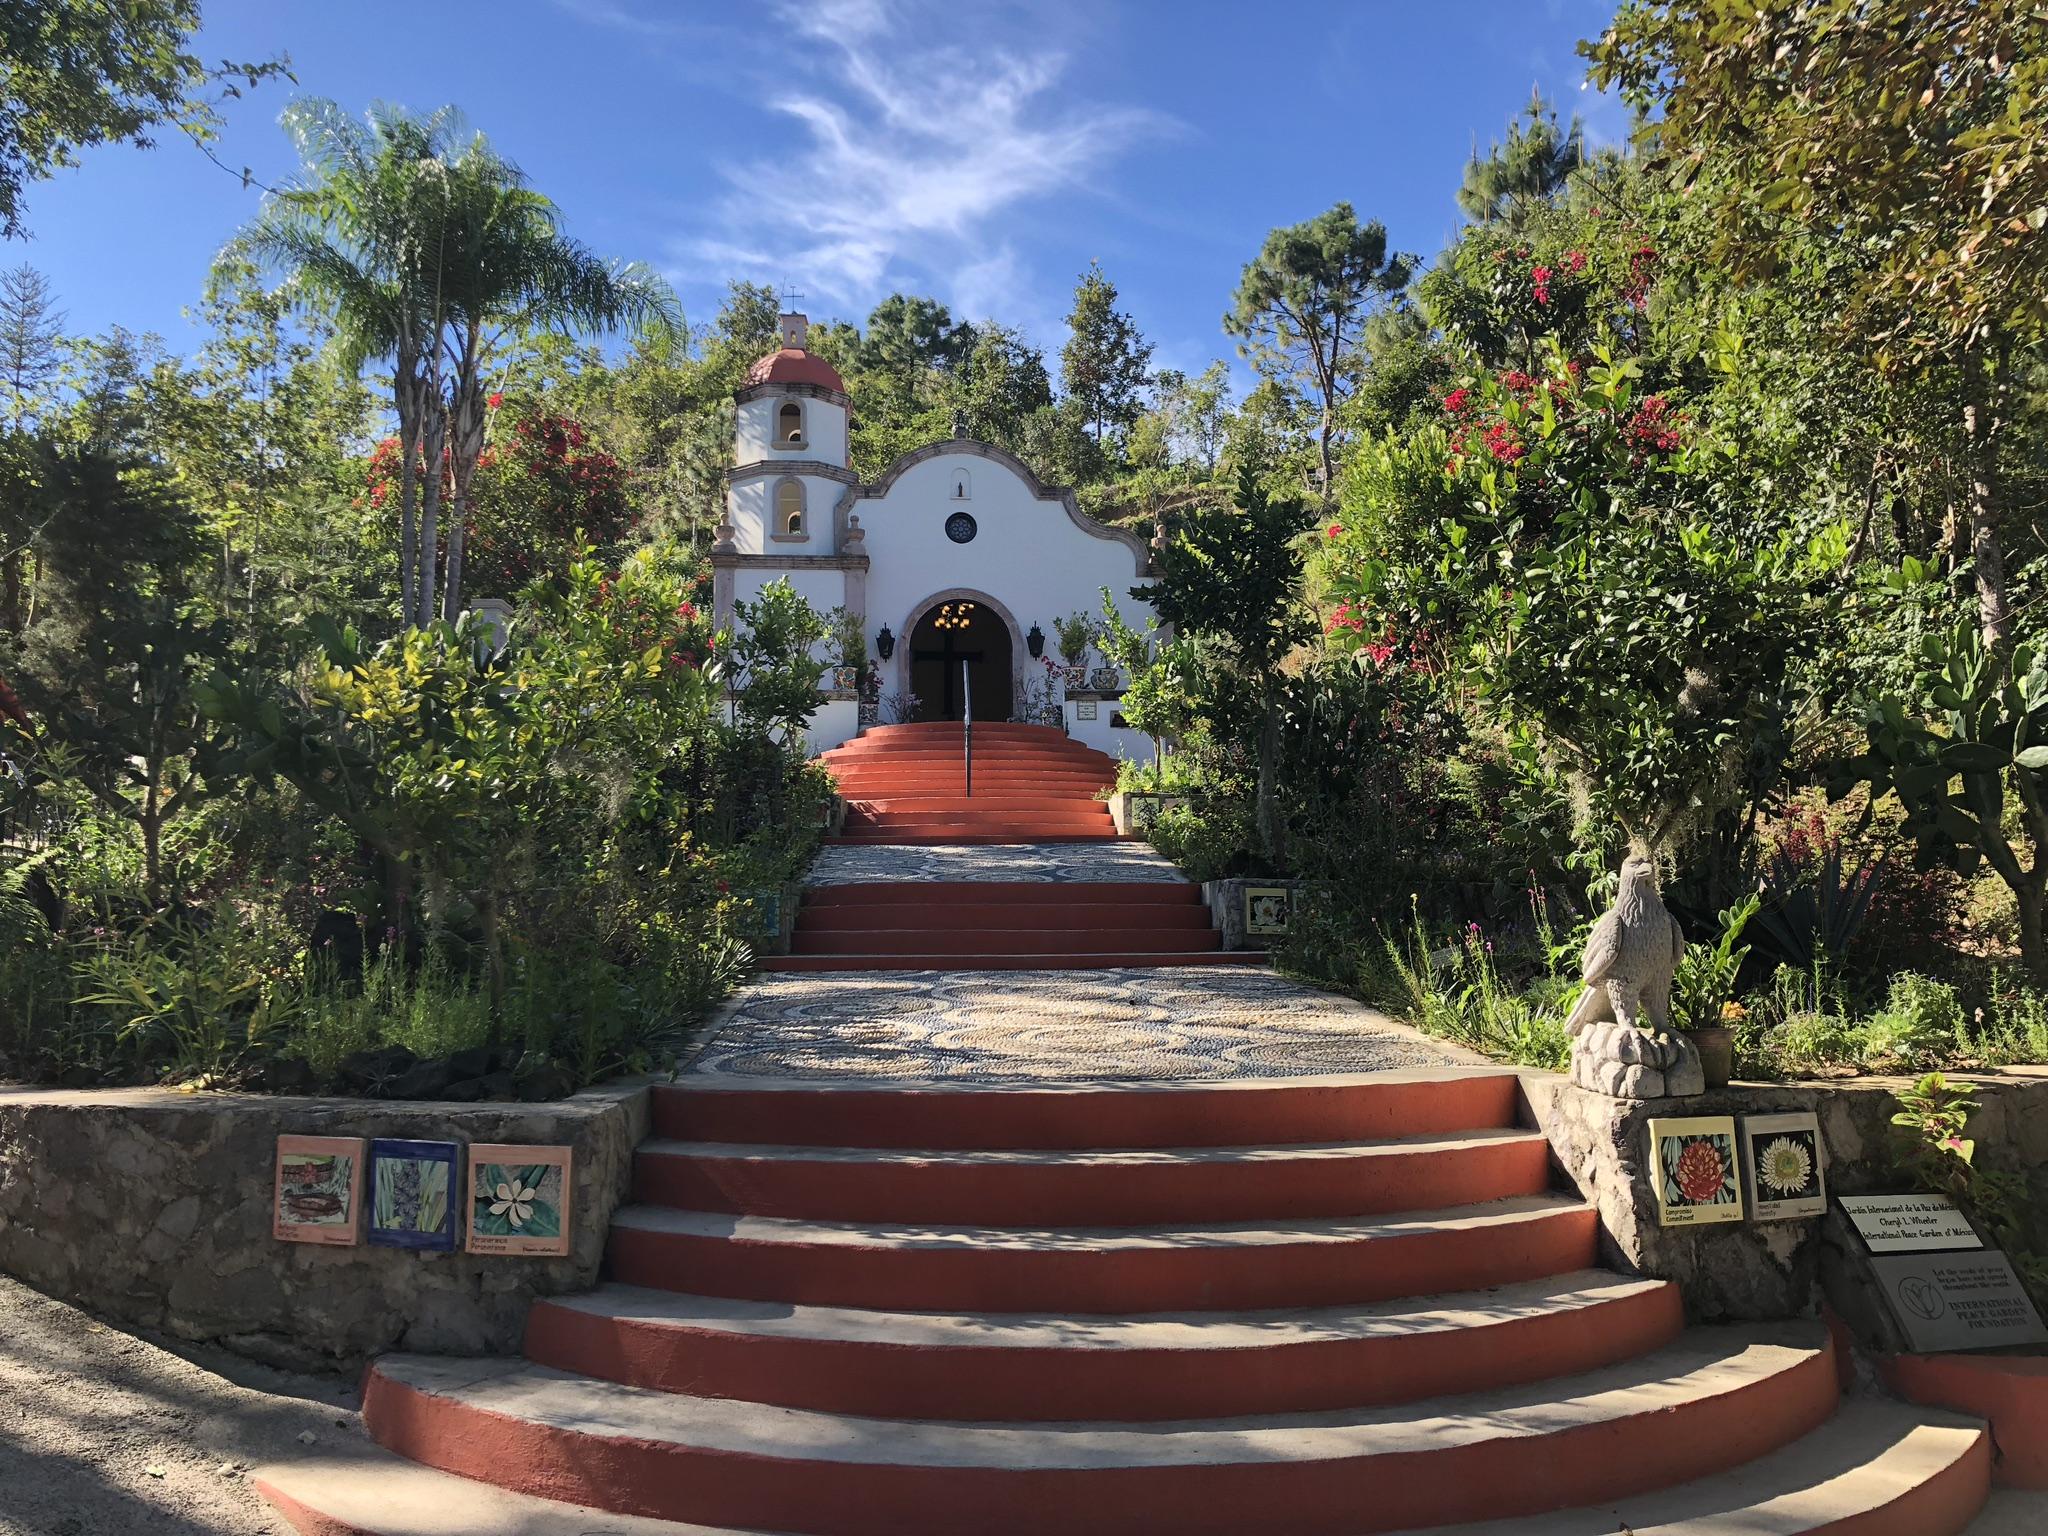 Jardin Botanica, Maito,Mascote,Talpa,Teuchitlan,Chapala